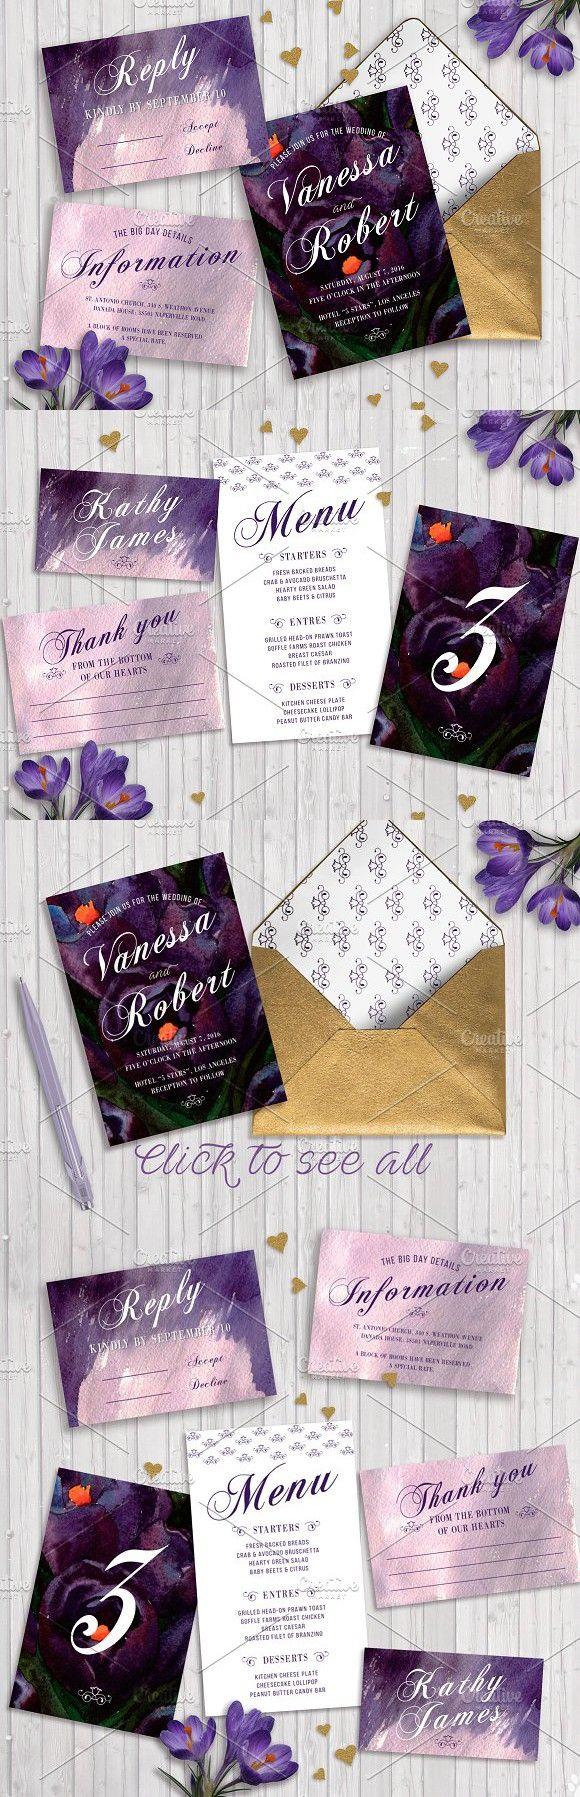 Wedding Invitation Template Crocus. Wedding Card Templates